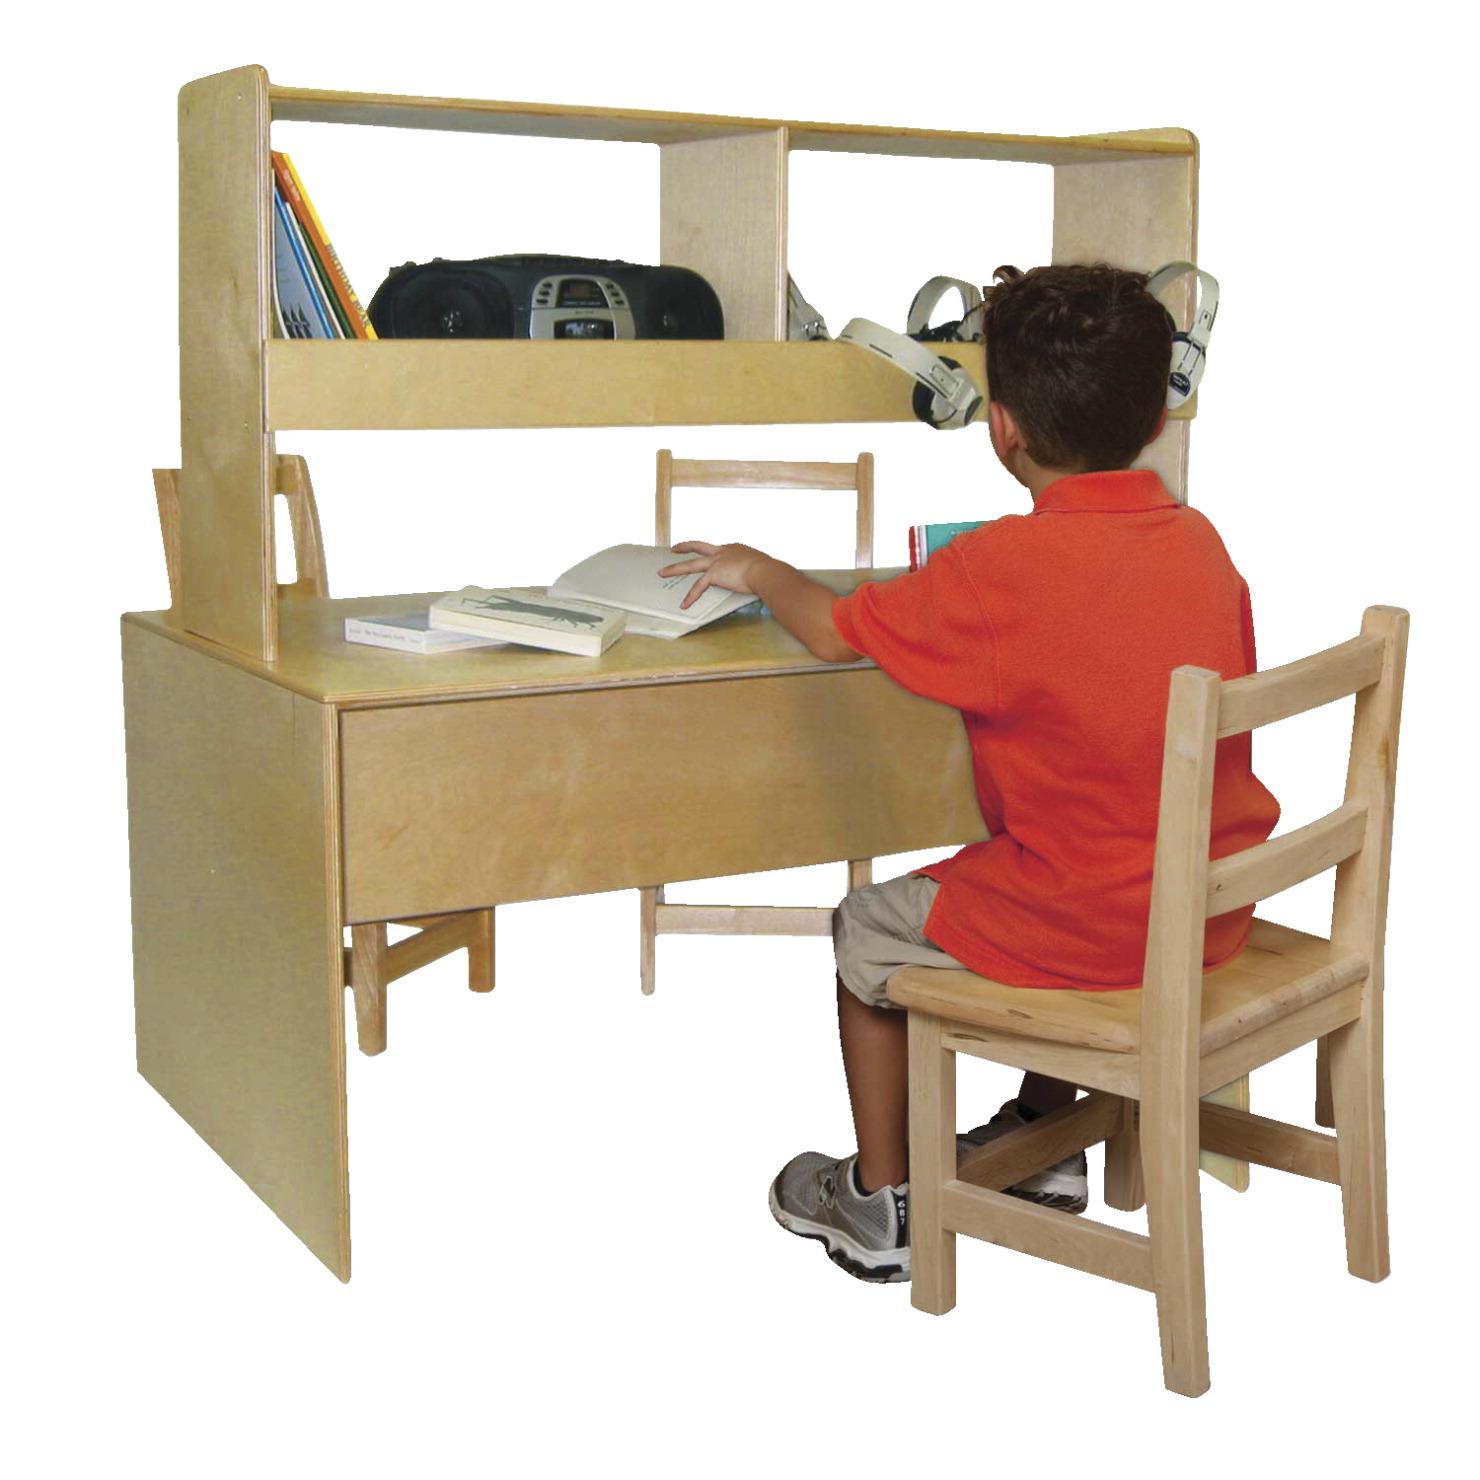 Listening center school specialty marketplace for Table design using jsp